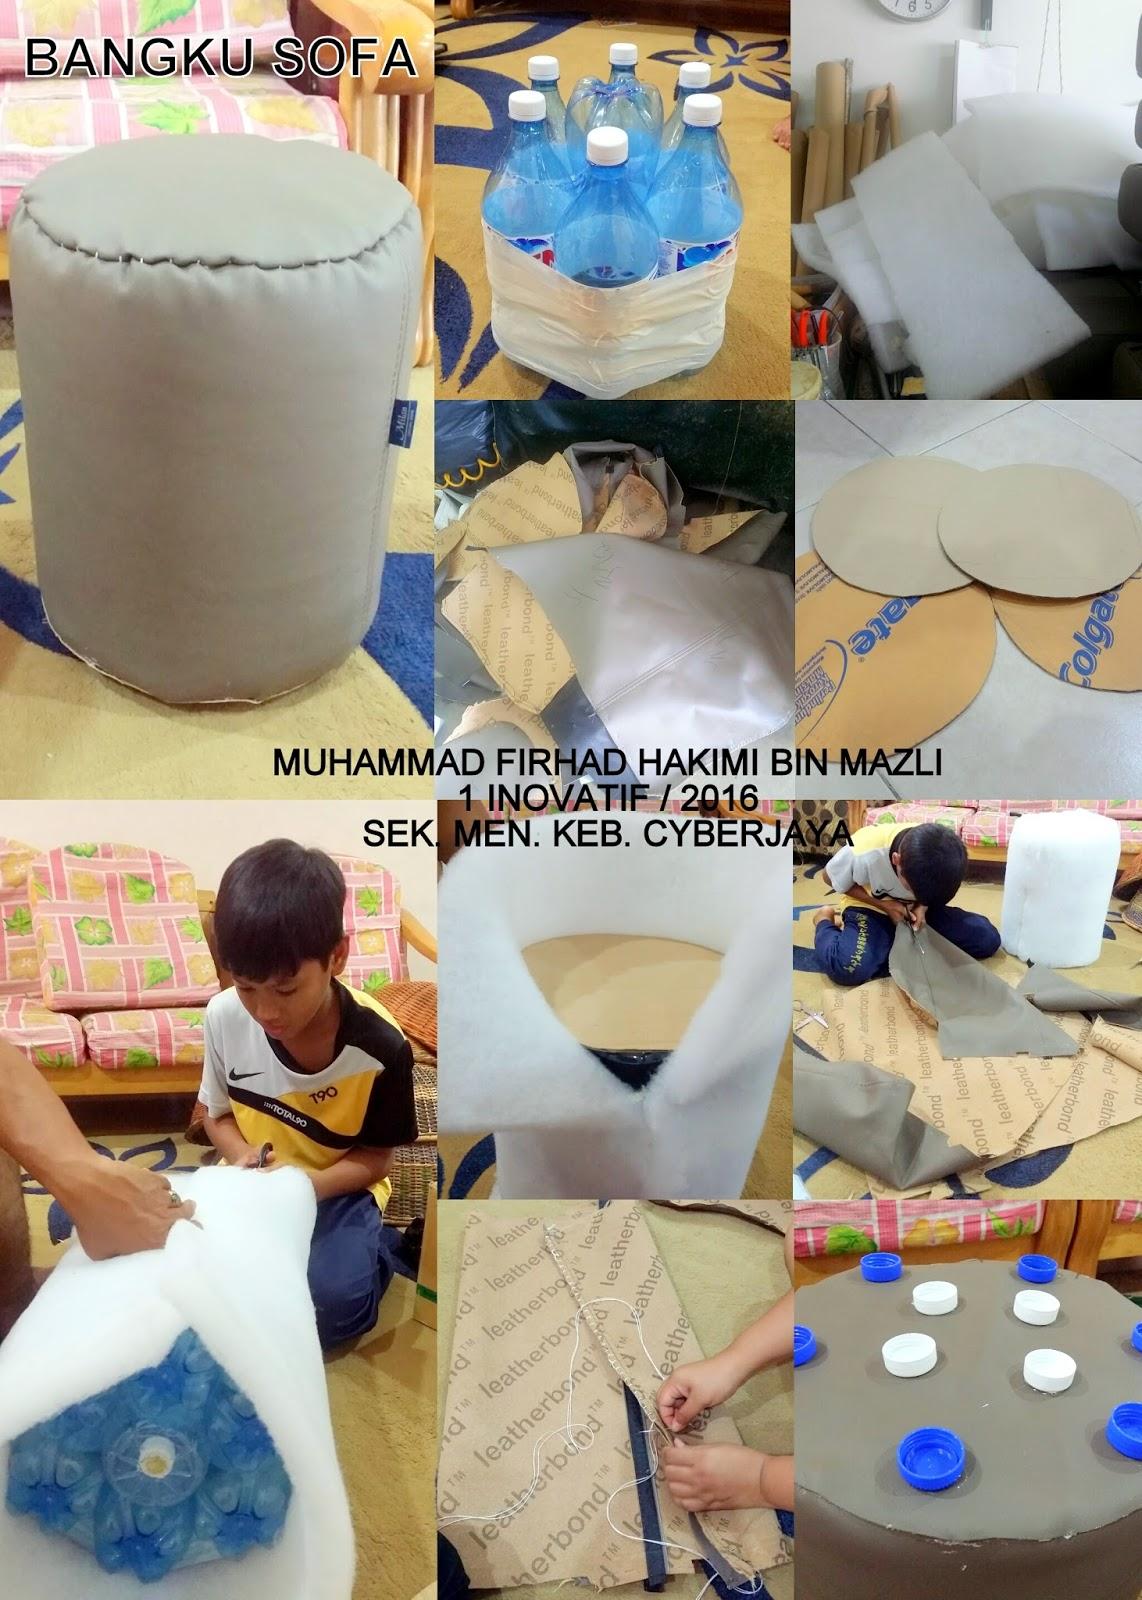 Emmymazli Projek Kitar Semula Geografi Tingkatan 1 Kimie : PhotoGrid1455354083108 from emmymazli-emmymazli.blogspot.com size 1142 x 1600 jpeg 322kB